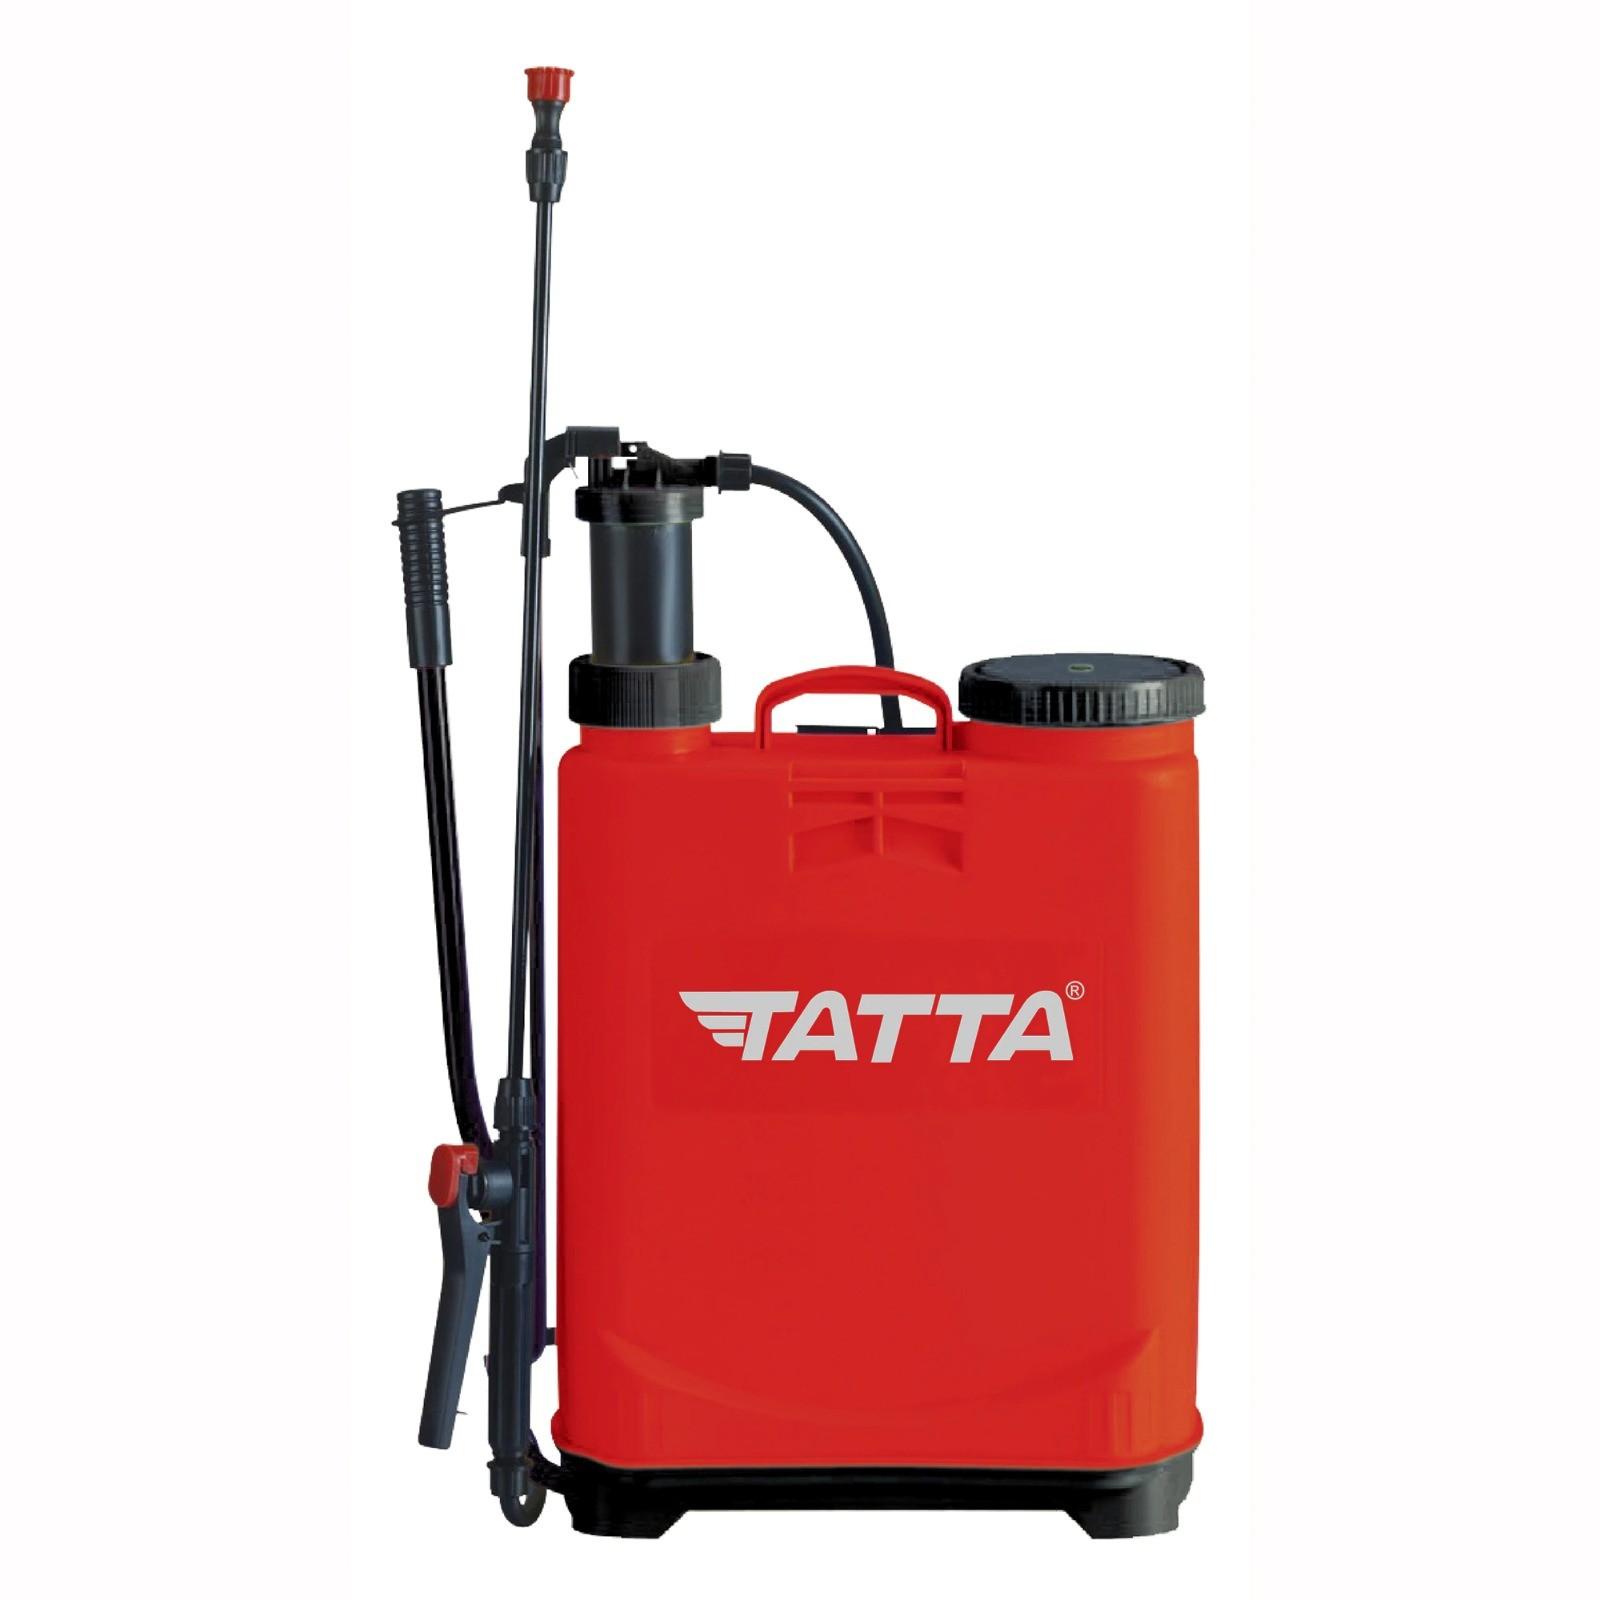 Pompa pentru stropit, tip vermorel, manuala, 16L, 2.4 bari, TP-181M